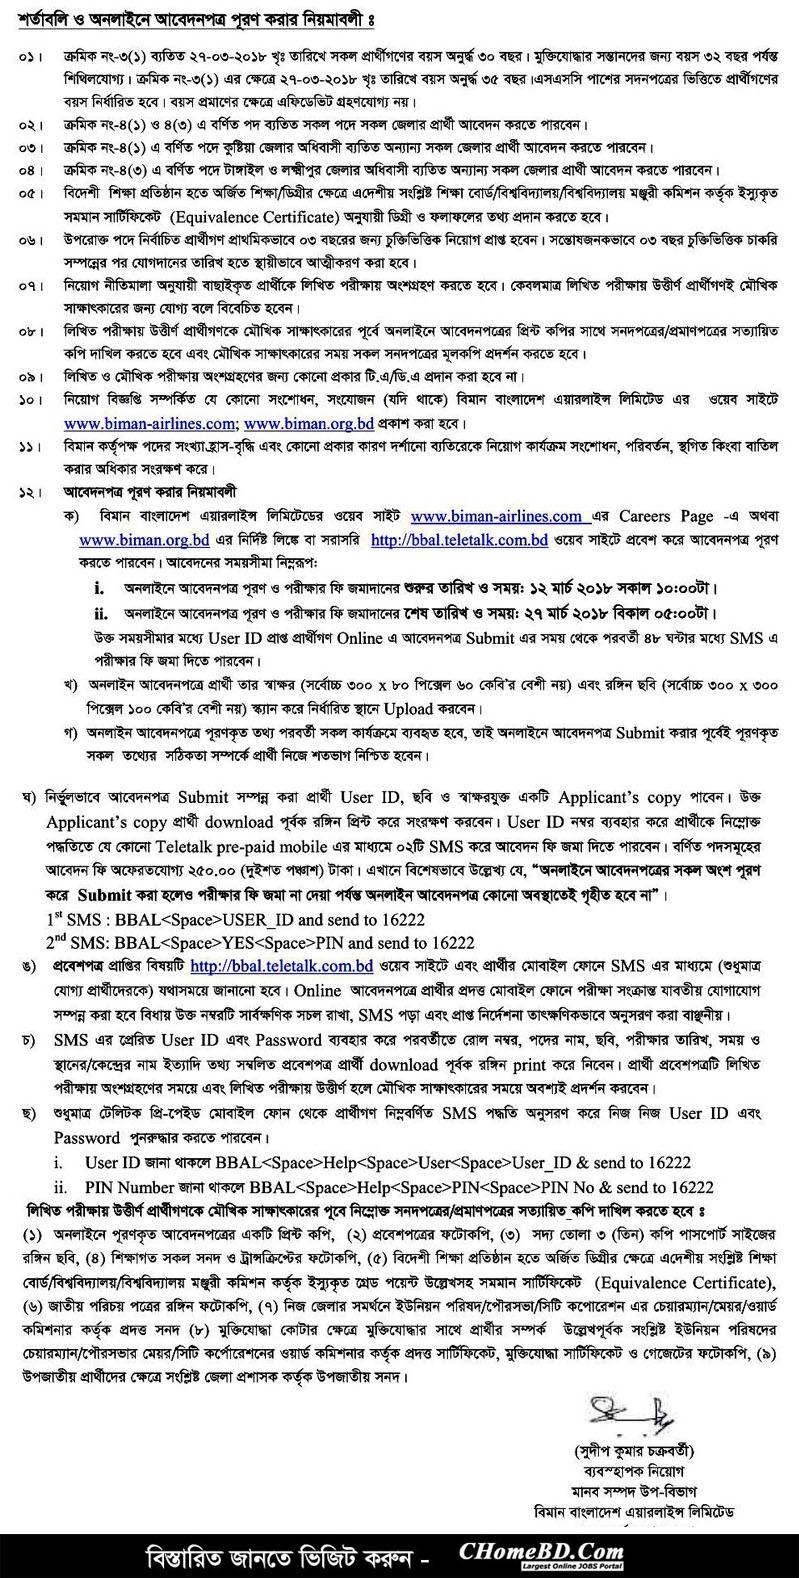 Bangladesh Biman Airlines Job Circular 2018